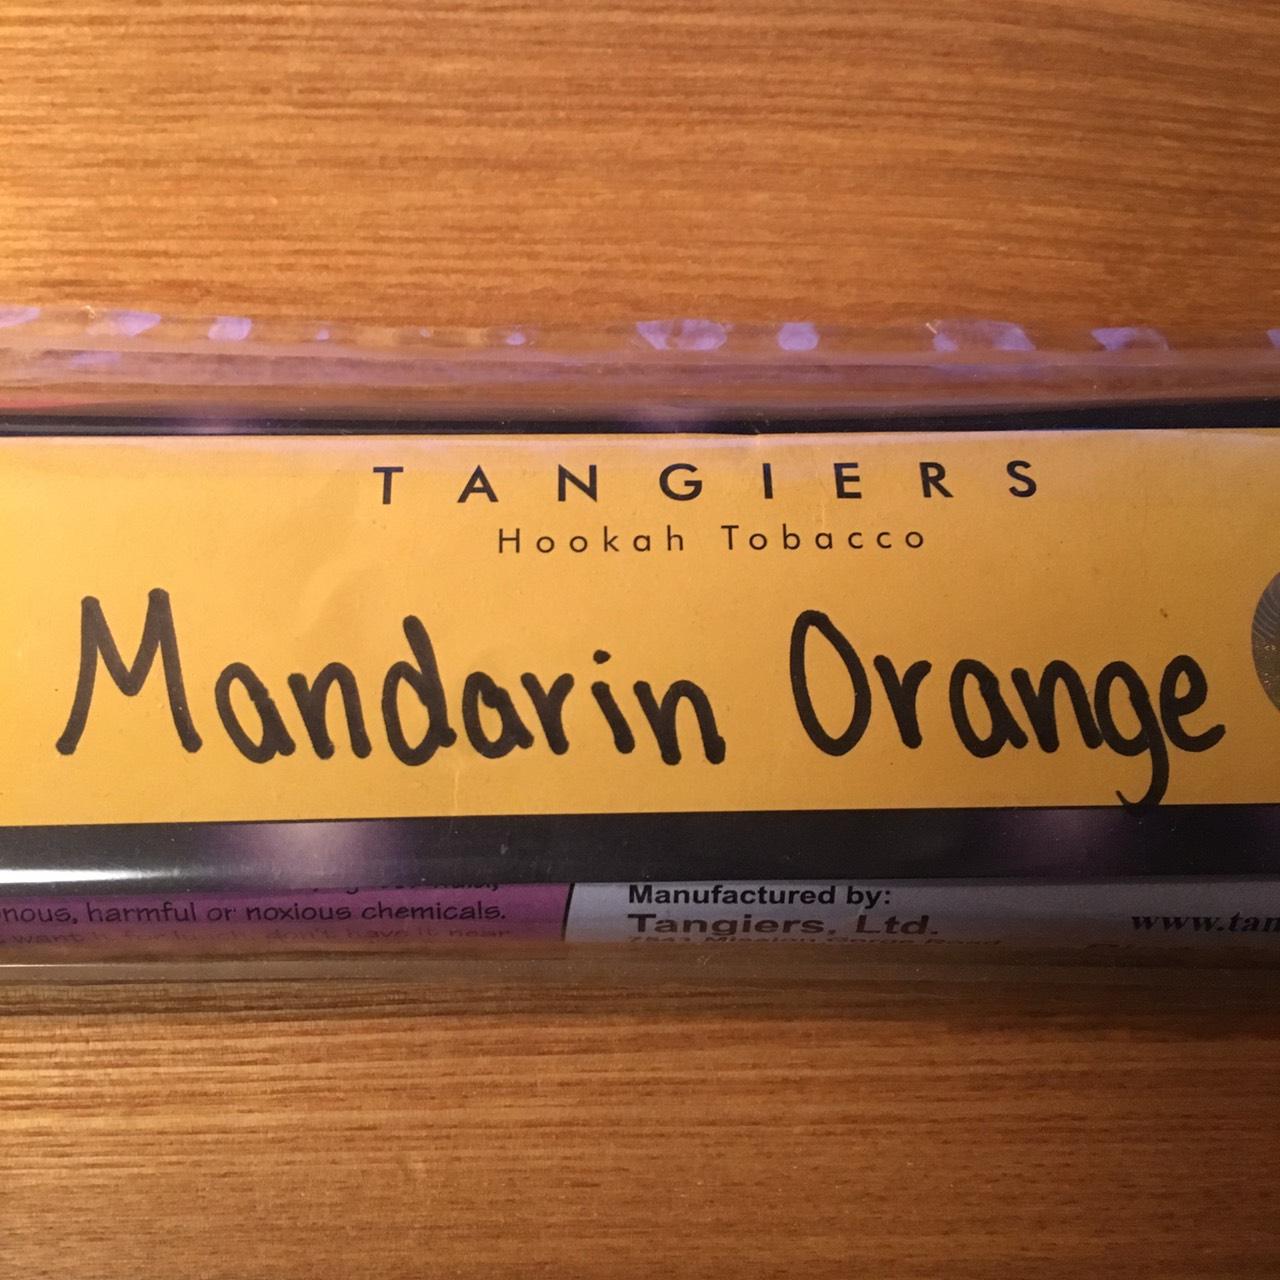 Tangiers Noir / Mandarin Orange(酸味と爽やかな甘い香りのバランスが良く、無難に良く出来たOrange系)